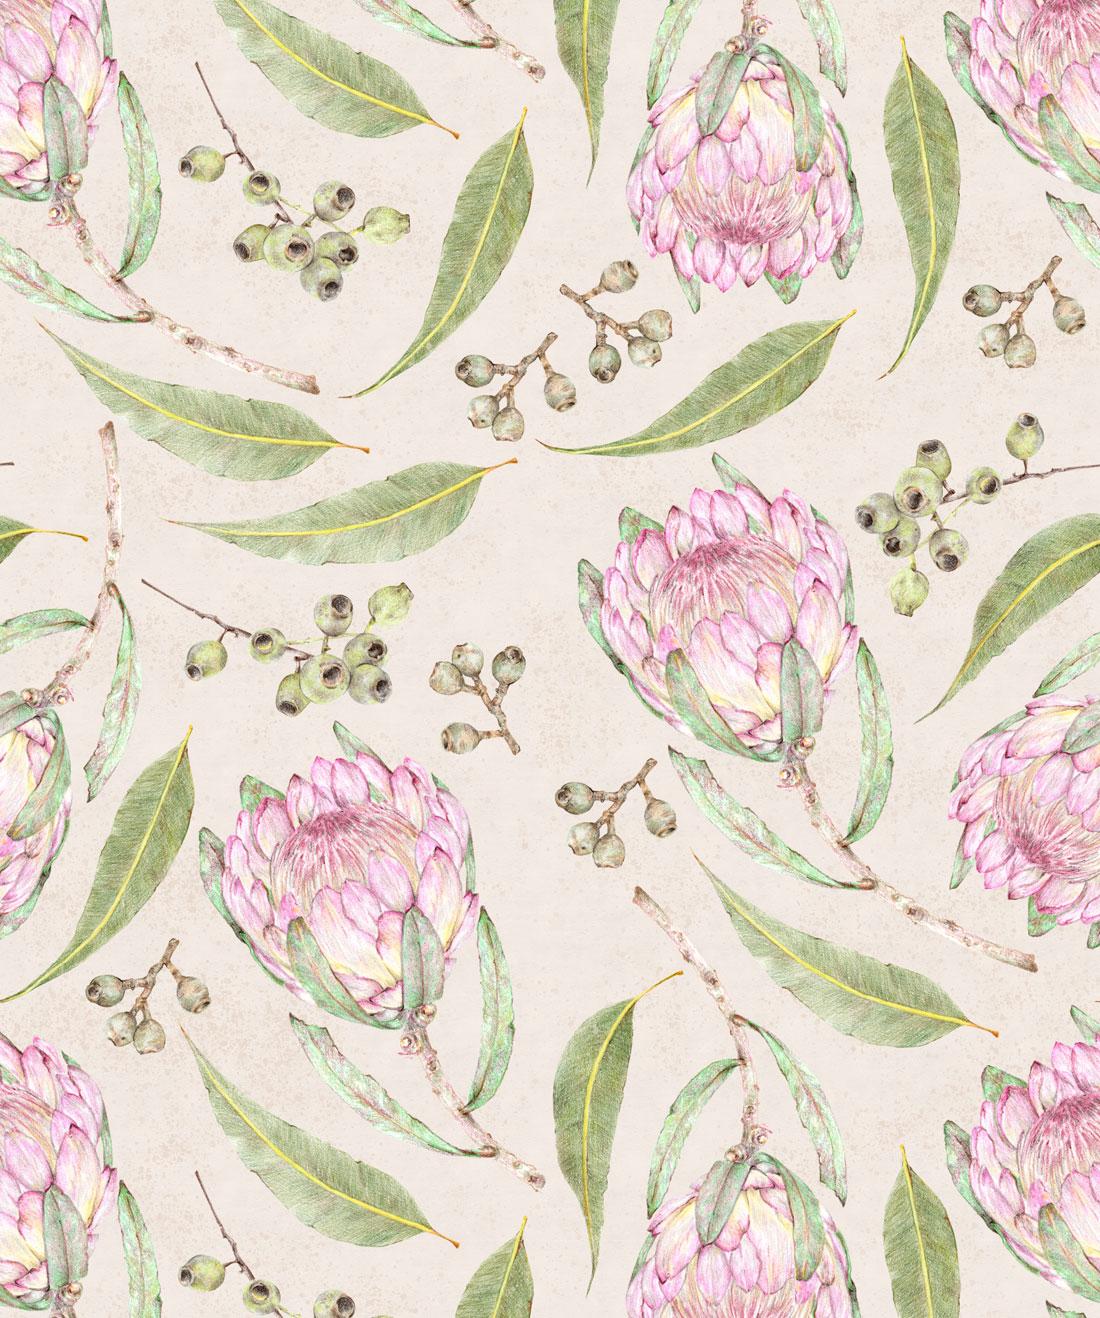 Proteas & Gumnuts Wallpaper